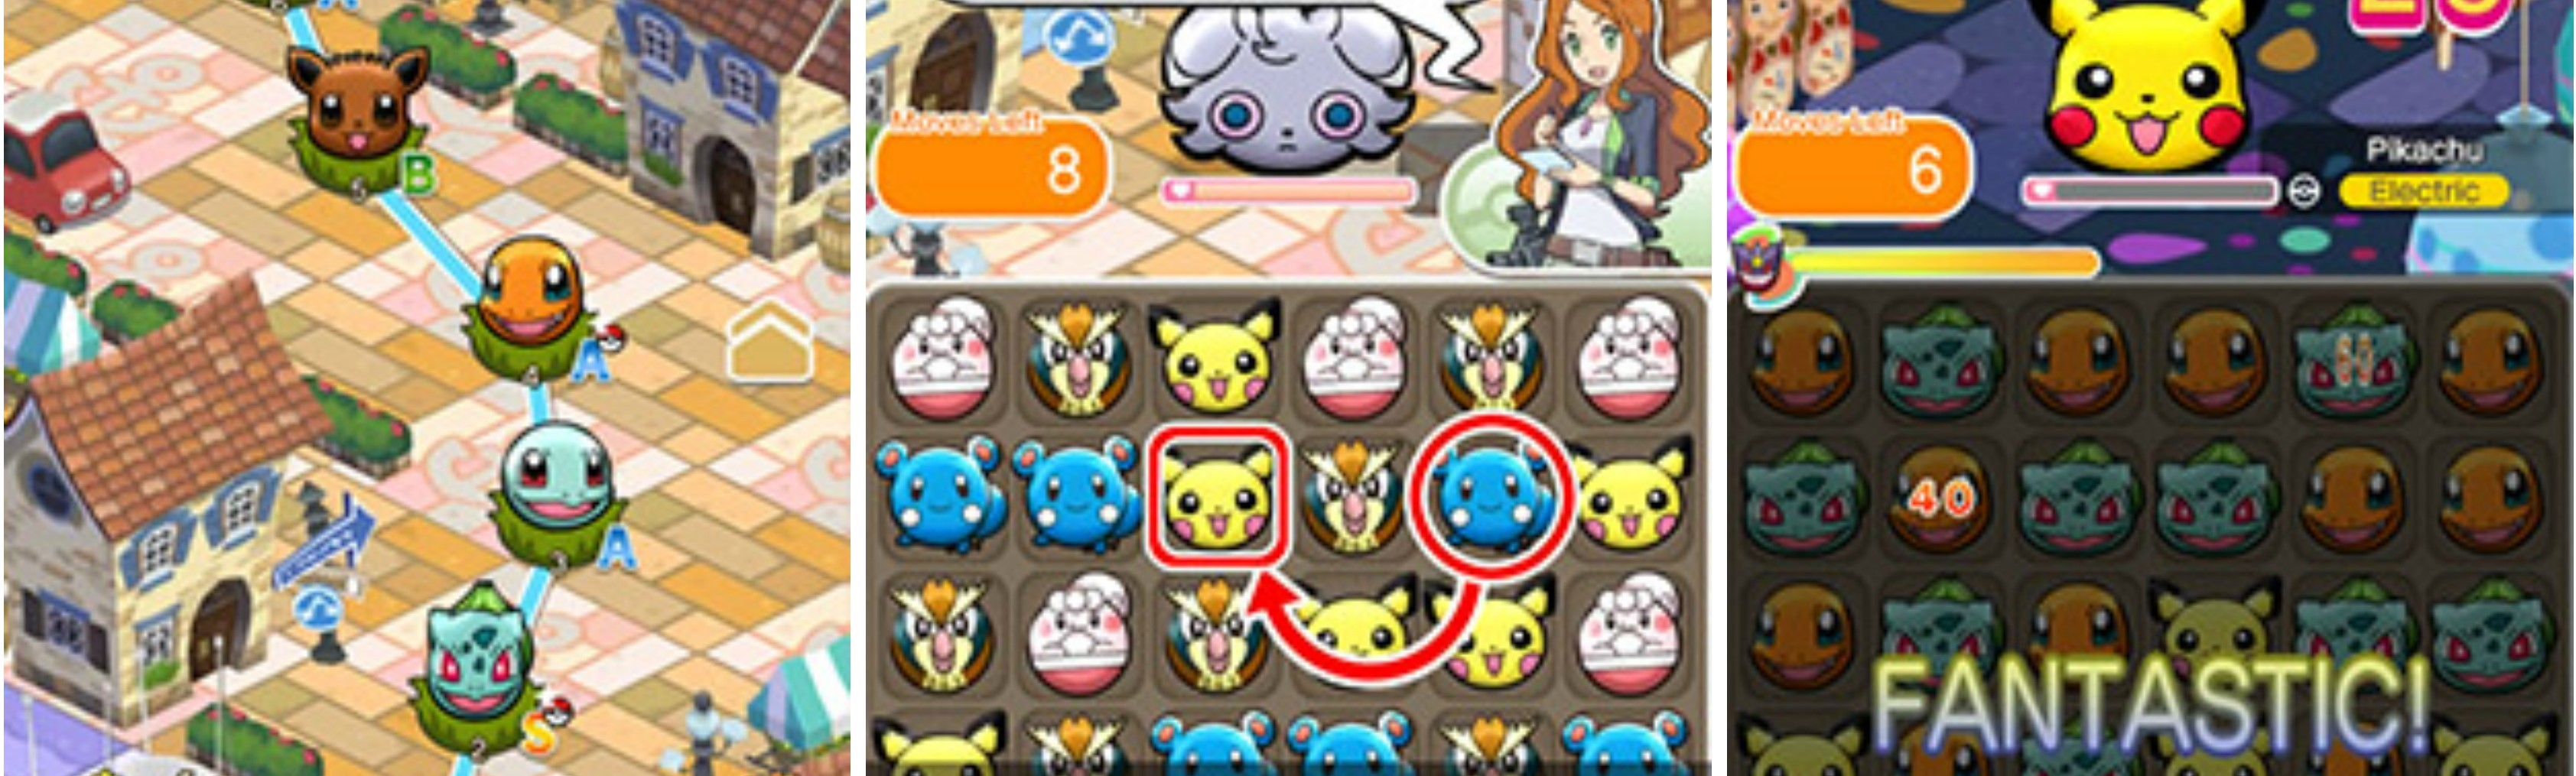 Pokemon-Shuffle-Mobile